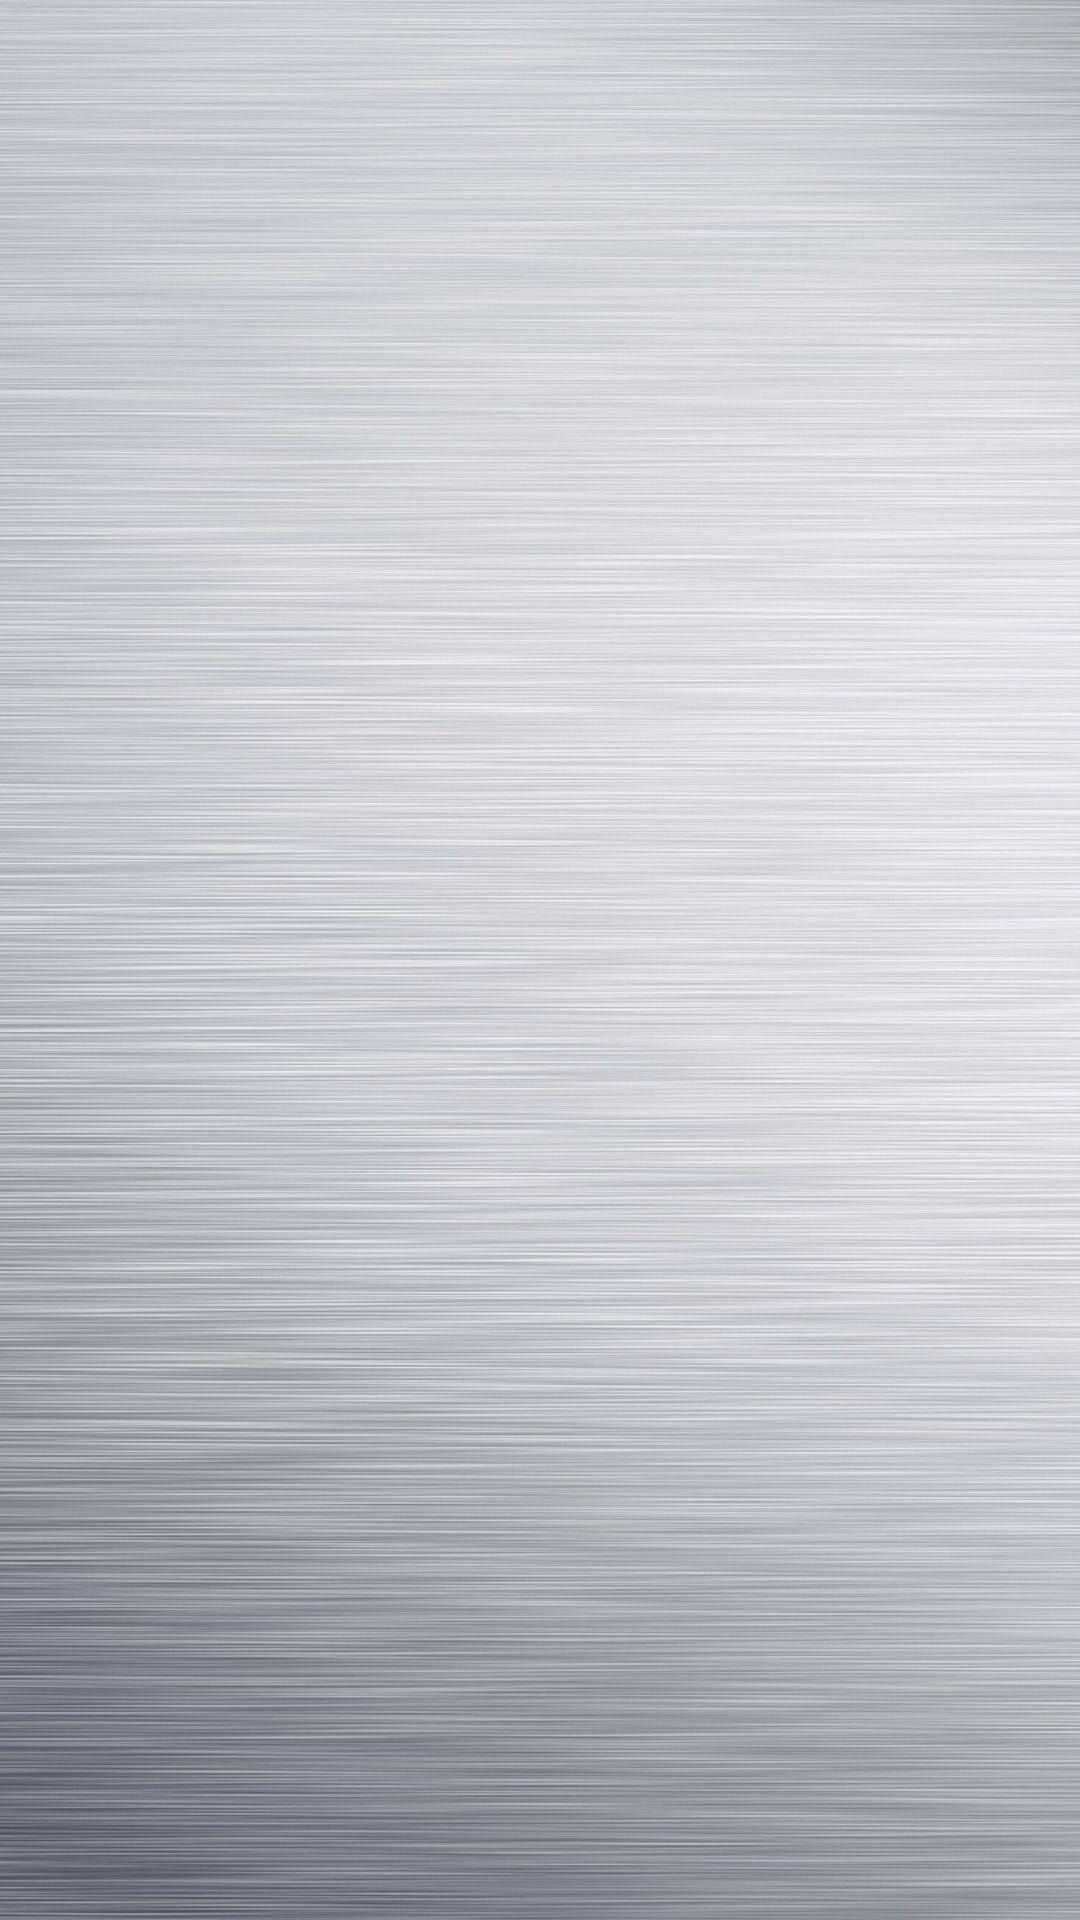 Simple Horizontal Brushed Metal Surface Iphone 6 Plus Hd Wallpaper Phone Wallpaper Patterns Silver Wallpaper Bright Wallpaper